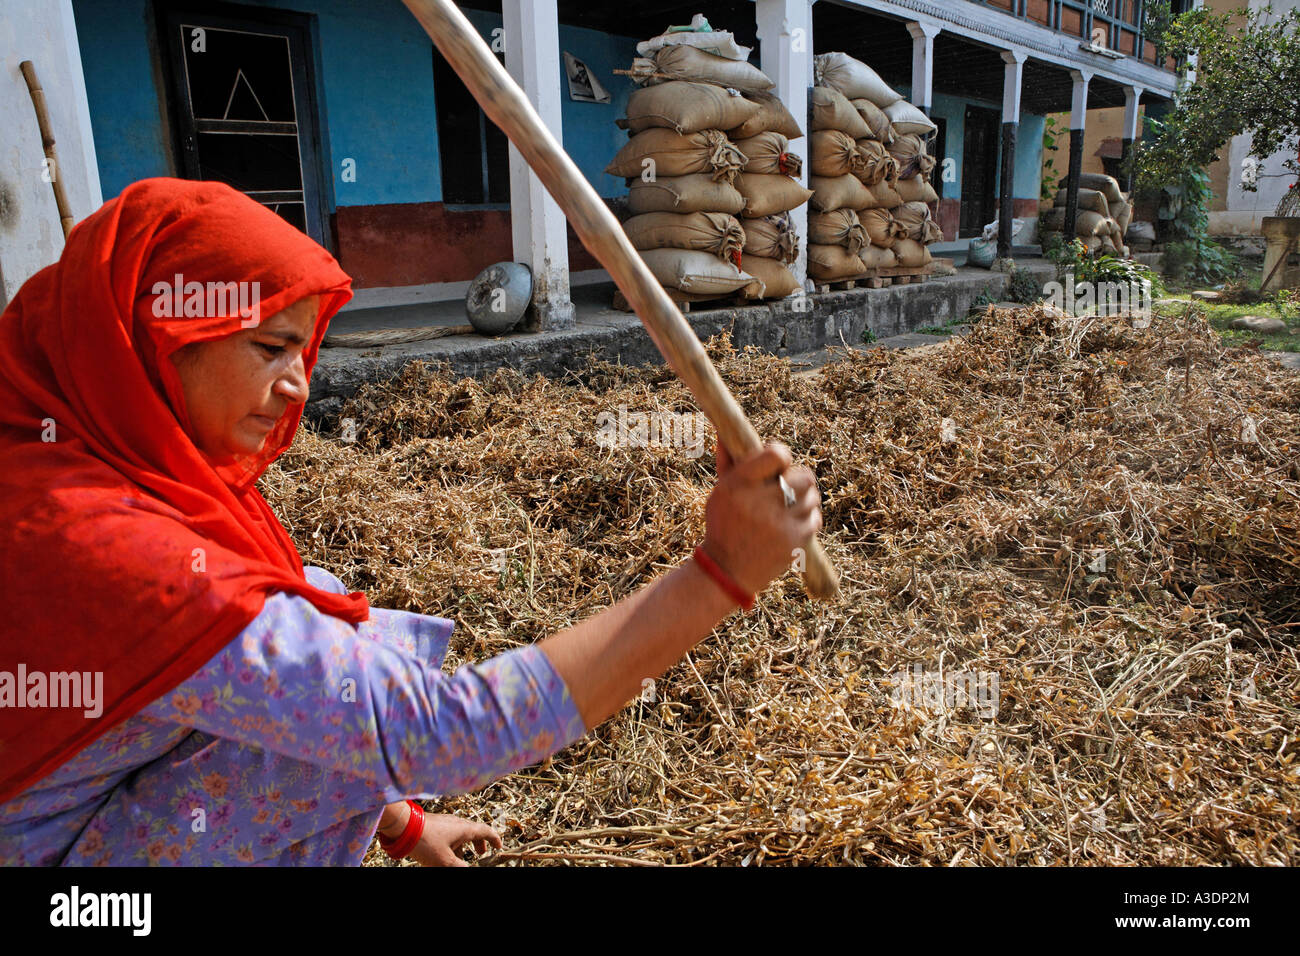 Indo-German-Changar-Eco-Development-Project, Sint Raksha Davi thrashing soy, Projekt in Dodu Dhaba, Shiv Naga, Palampur - Stock Image